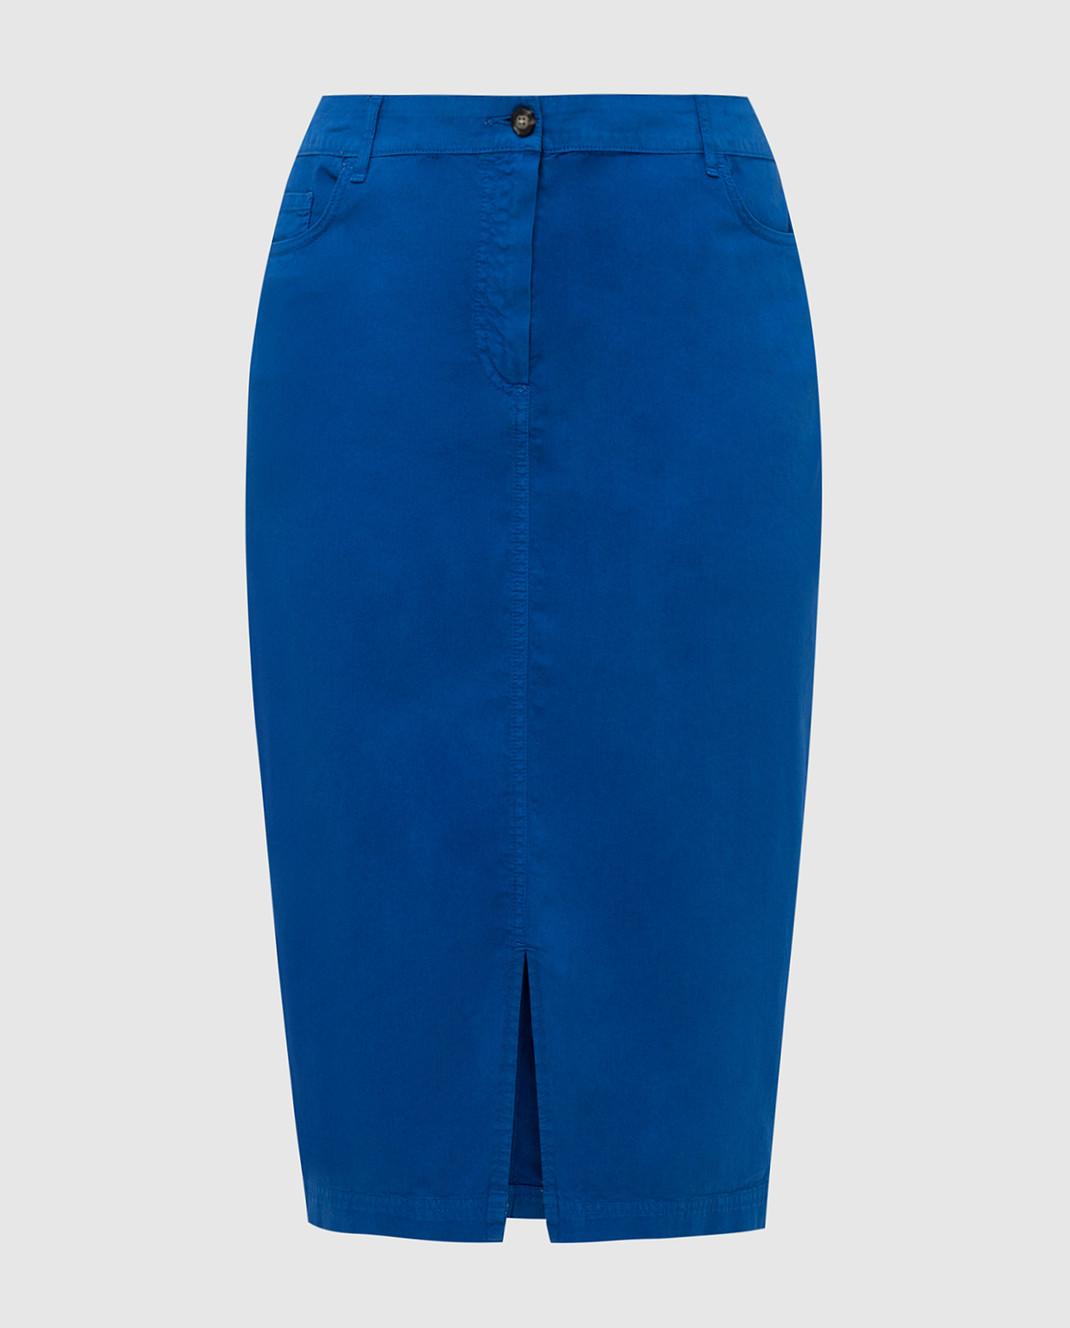 Marina Sport by Marina Rinaldi Темно-синяя джинсовая юбка CAROTENE